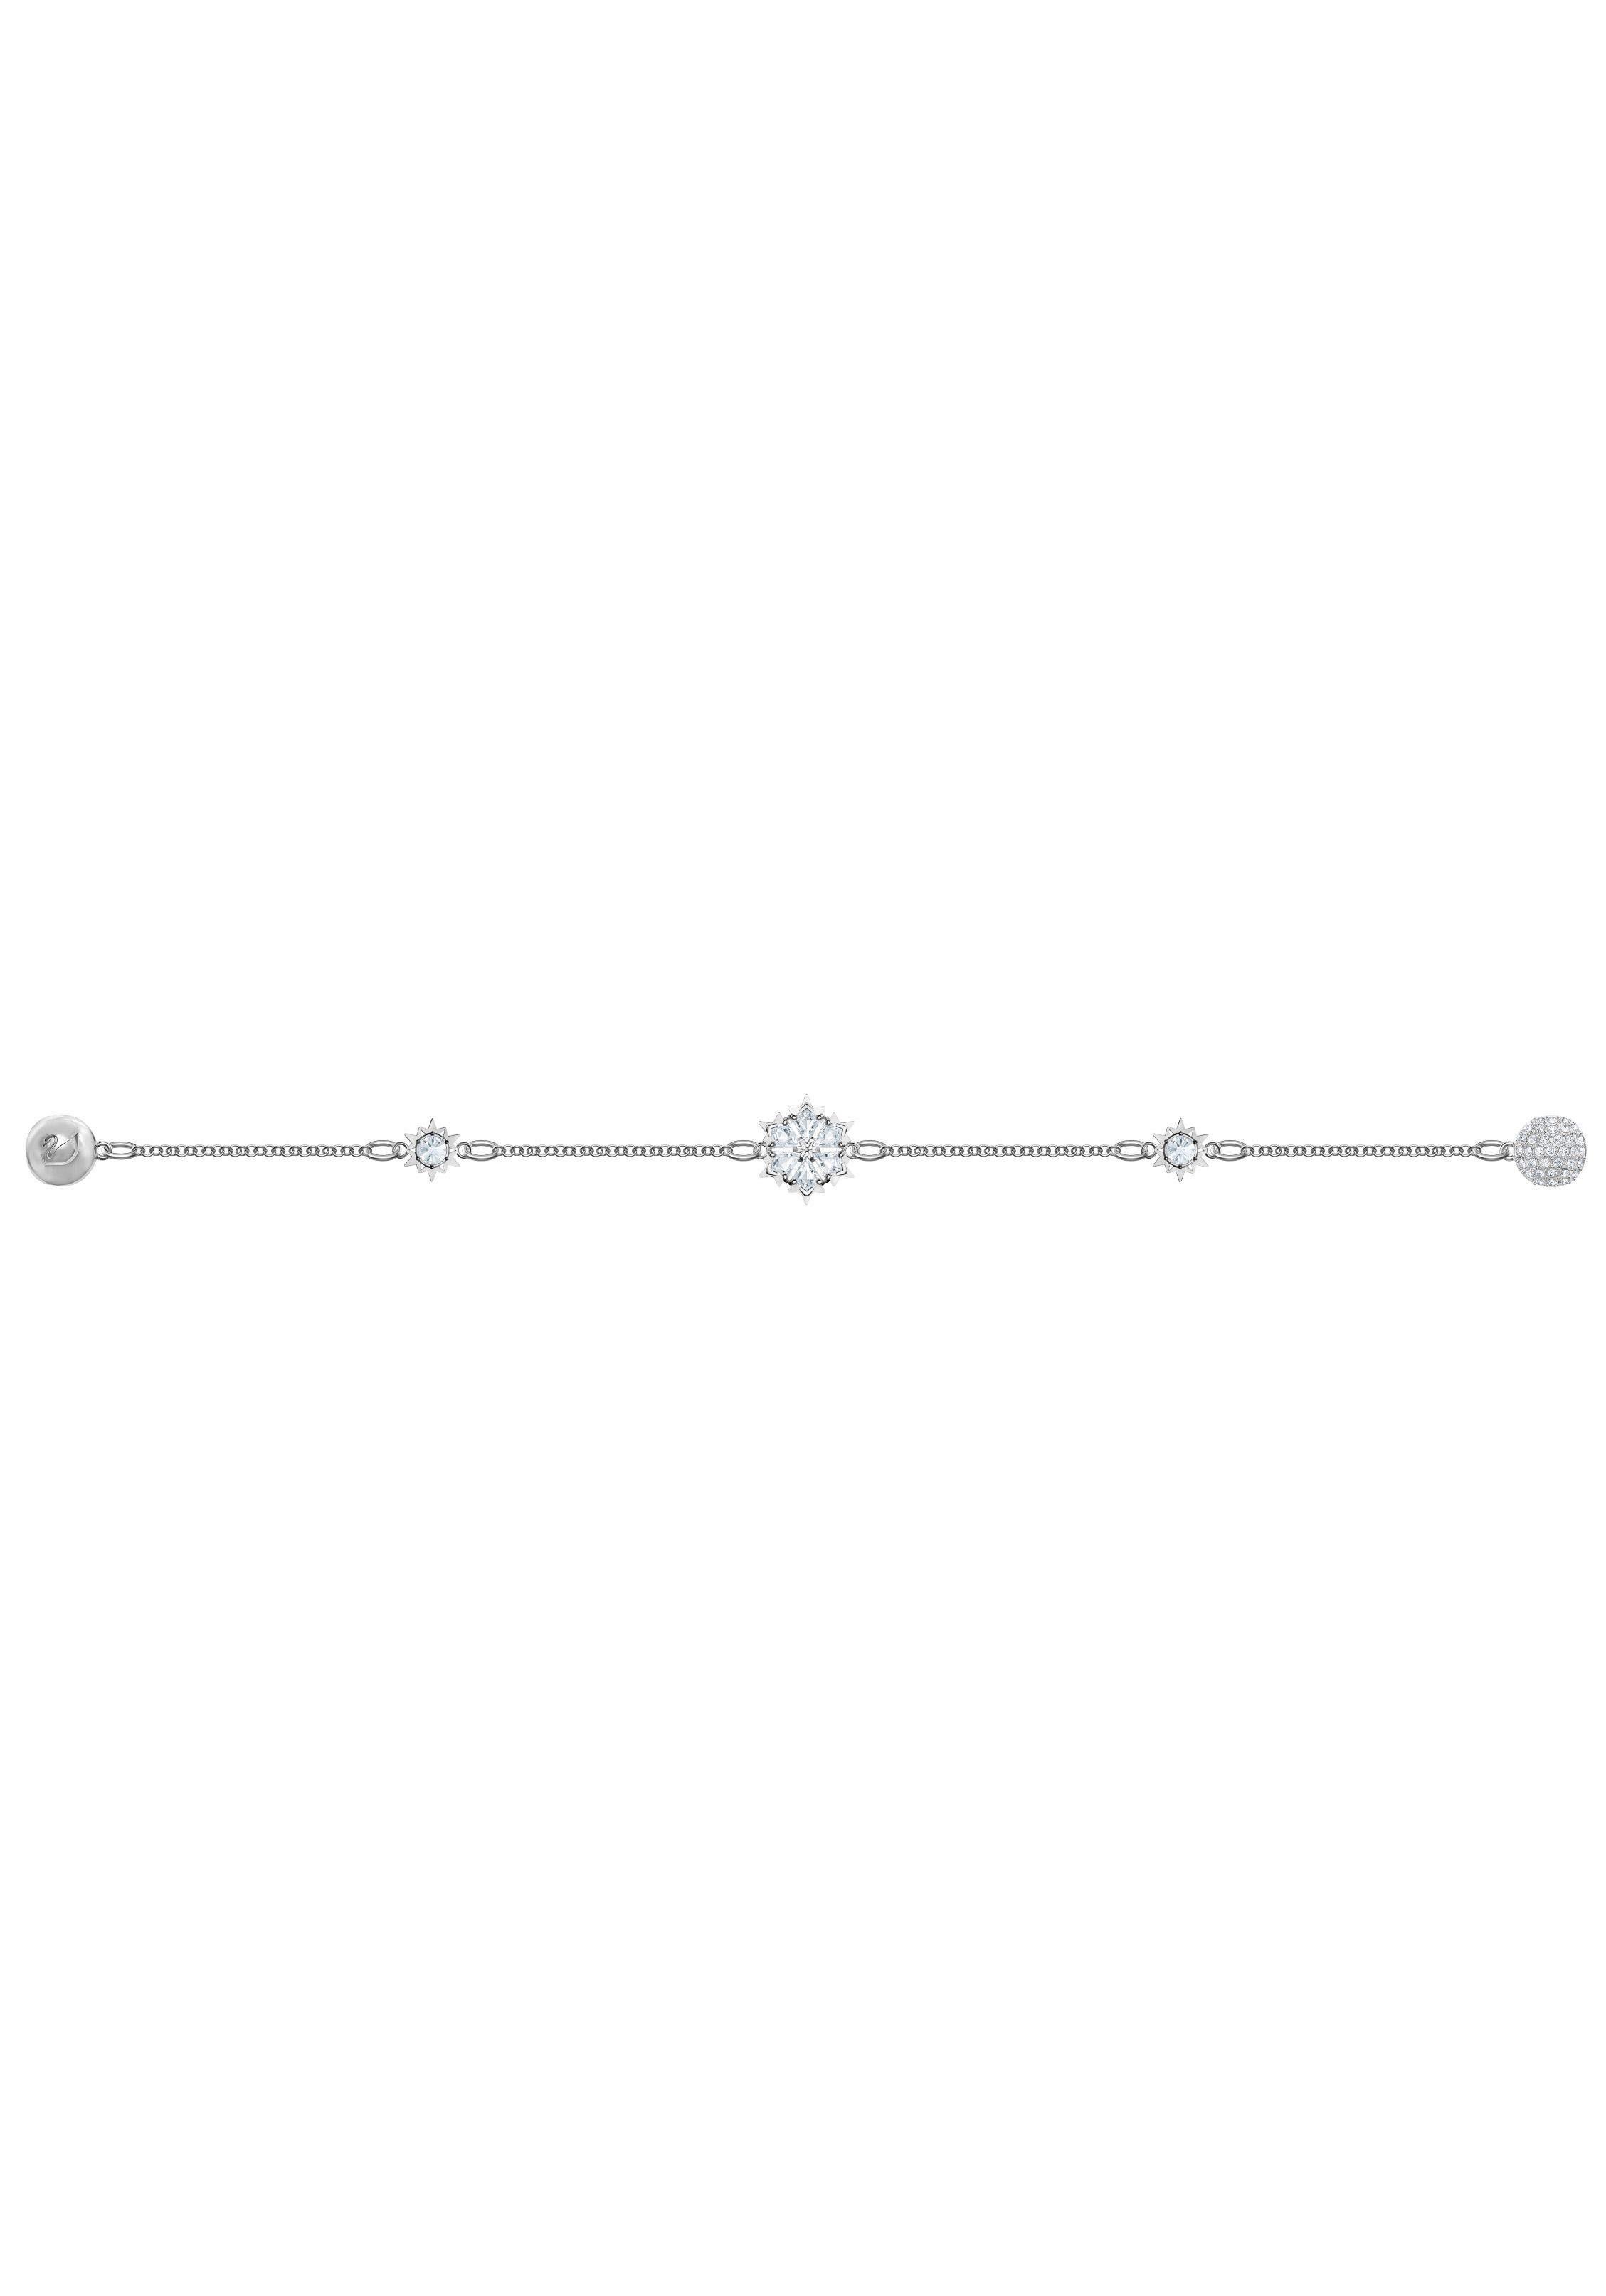 Remix »swarovski Swarovski Armband Online Mit Swarovski® Kristallen Kaufen mL« Snowflake5432735 Collection pVqMzSU